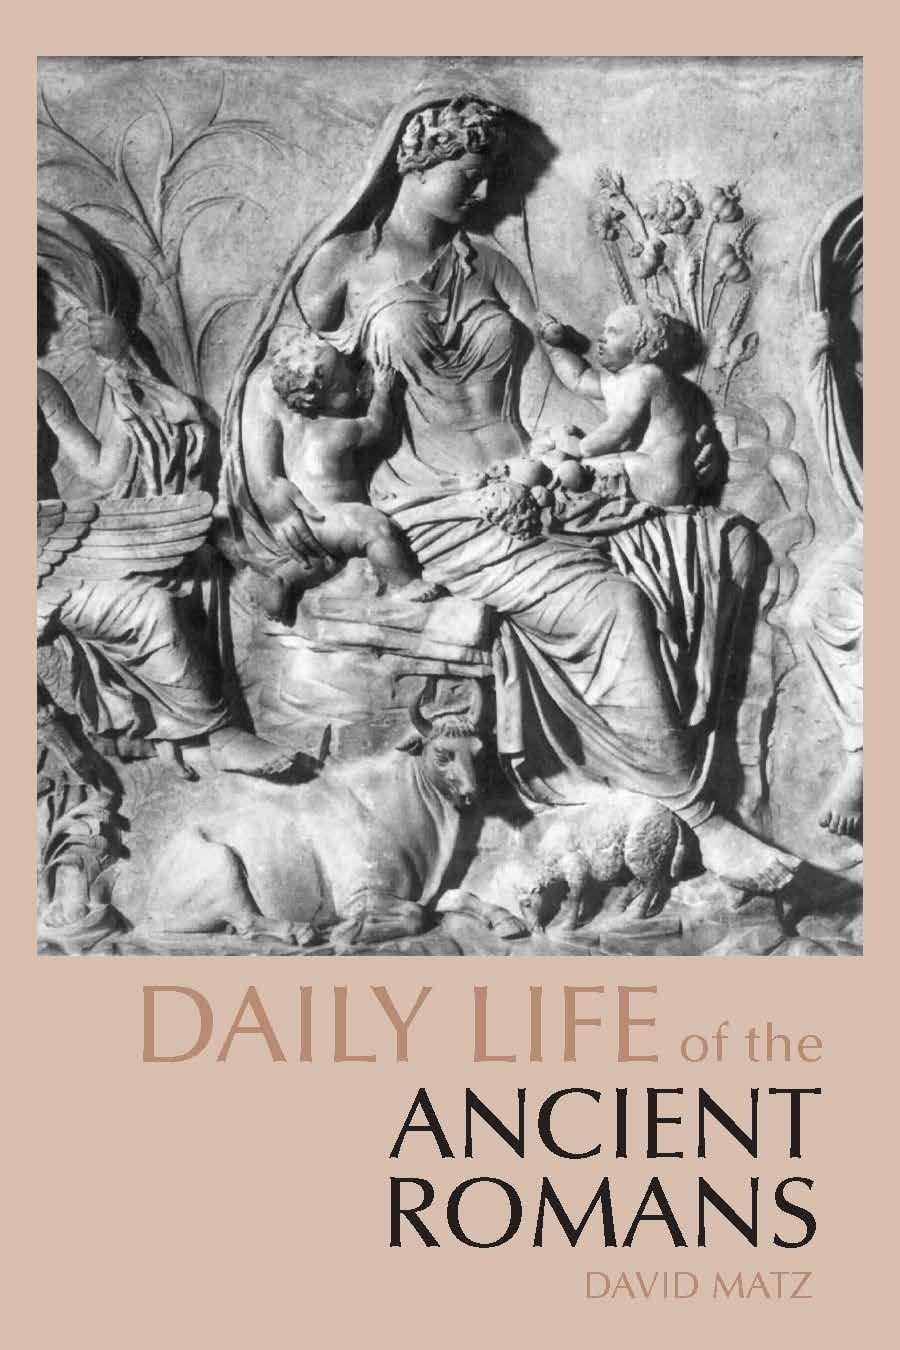 Daily Life of the Ancient Romans (The Daily Life Through History series) por David Matz